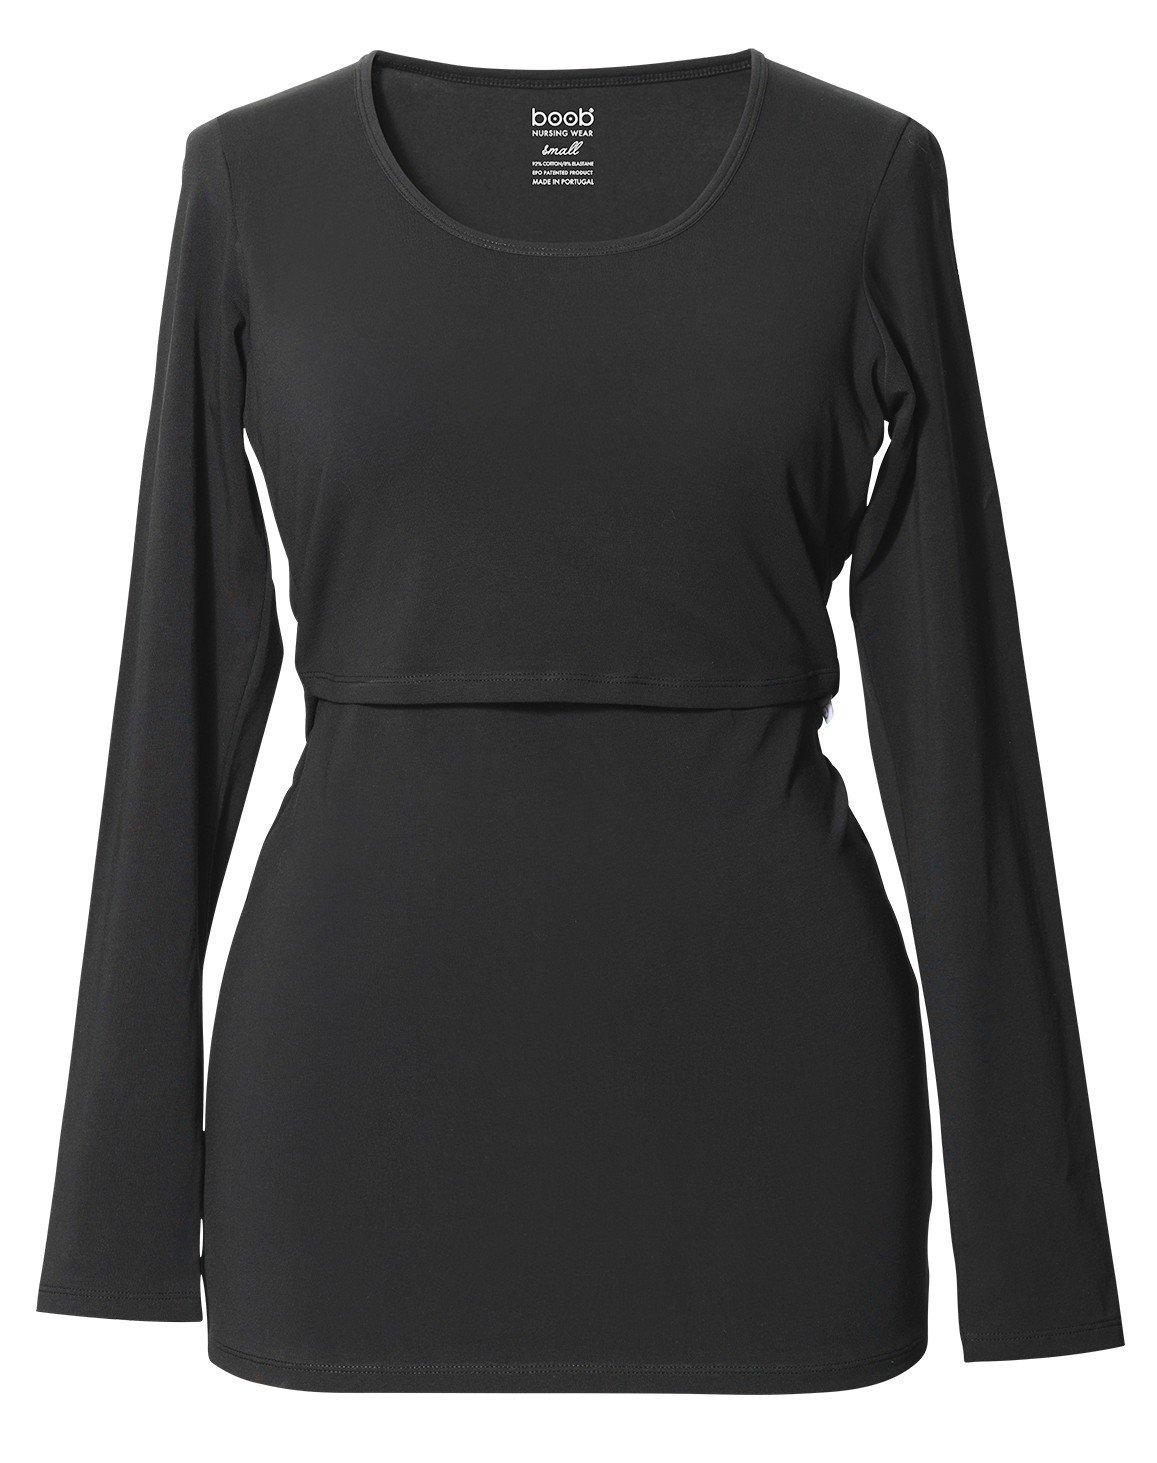 Boob Organic Cotton Round Neck Long Sleeve Nursing Top - Black - Large by Boob Design